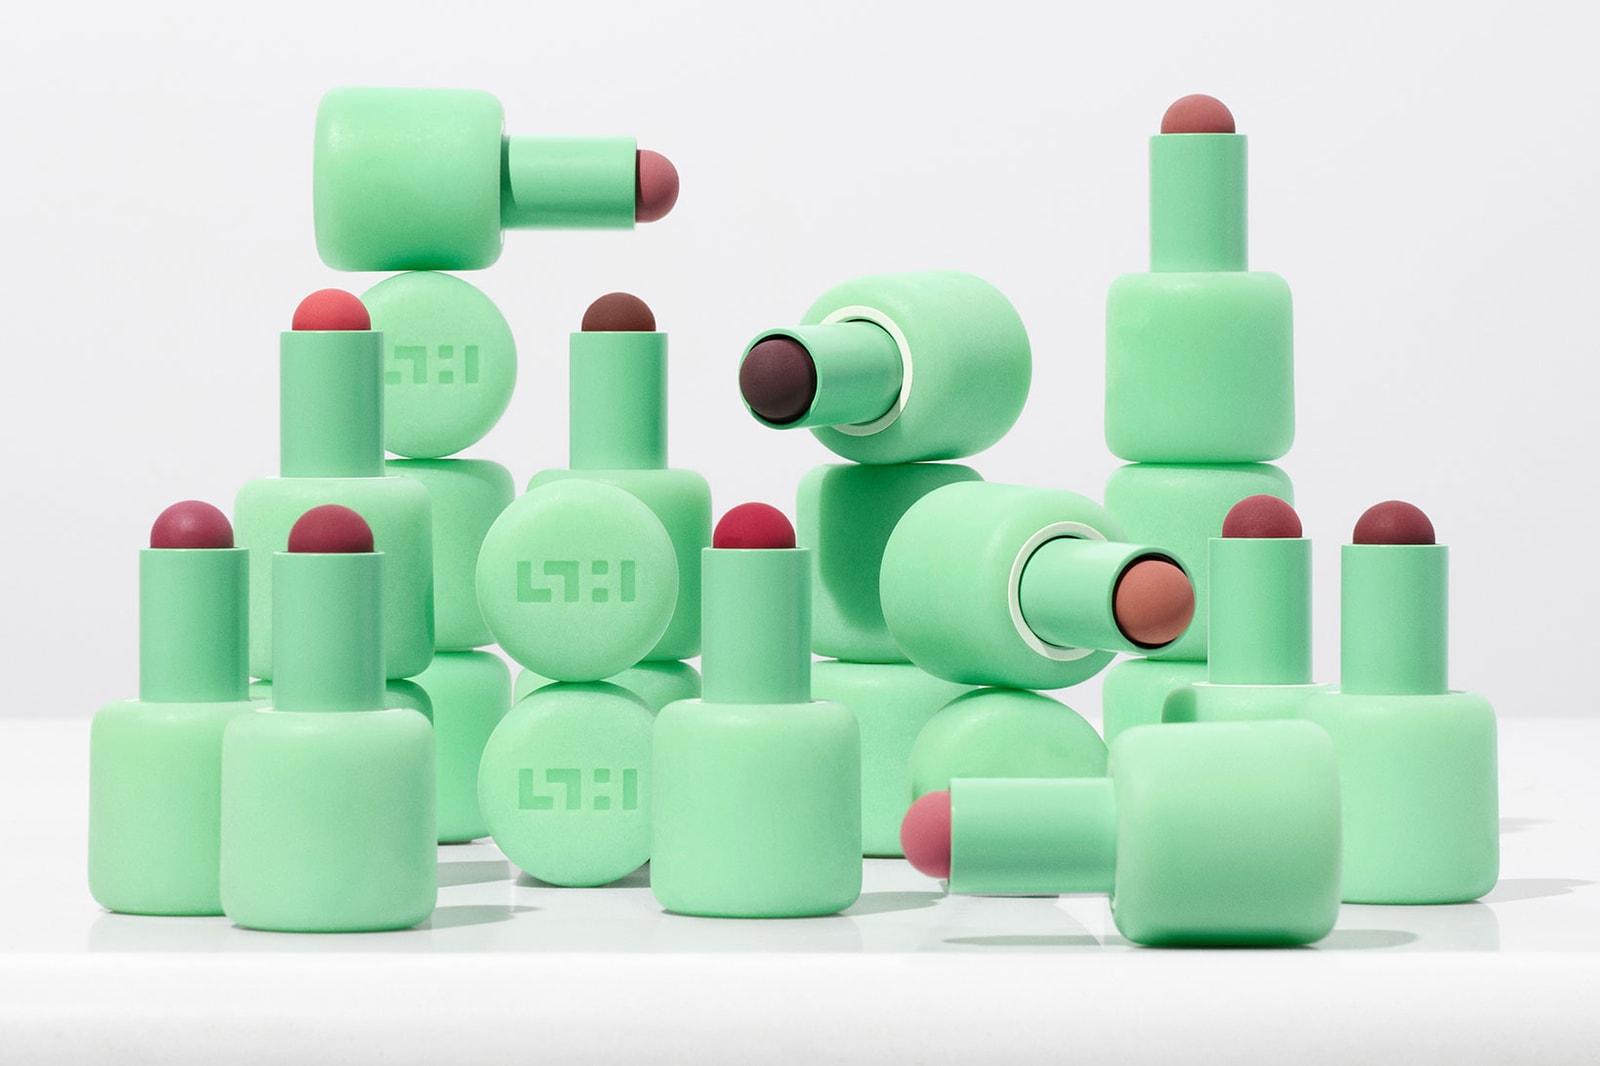 simi haze khadra beauty brand makeup launch campaign hugo comte release price where to buy